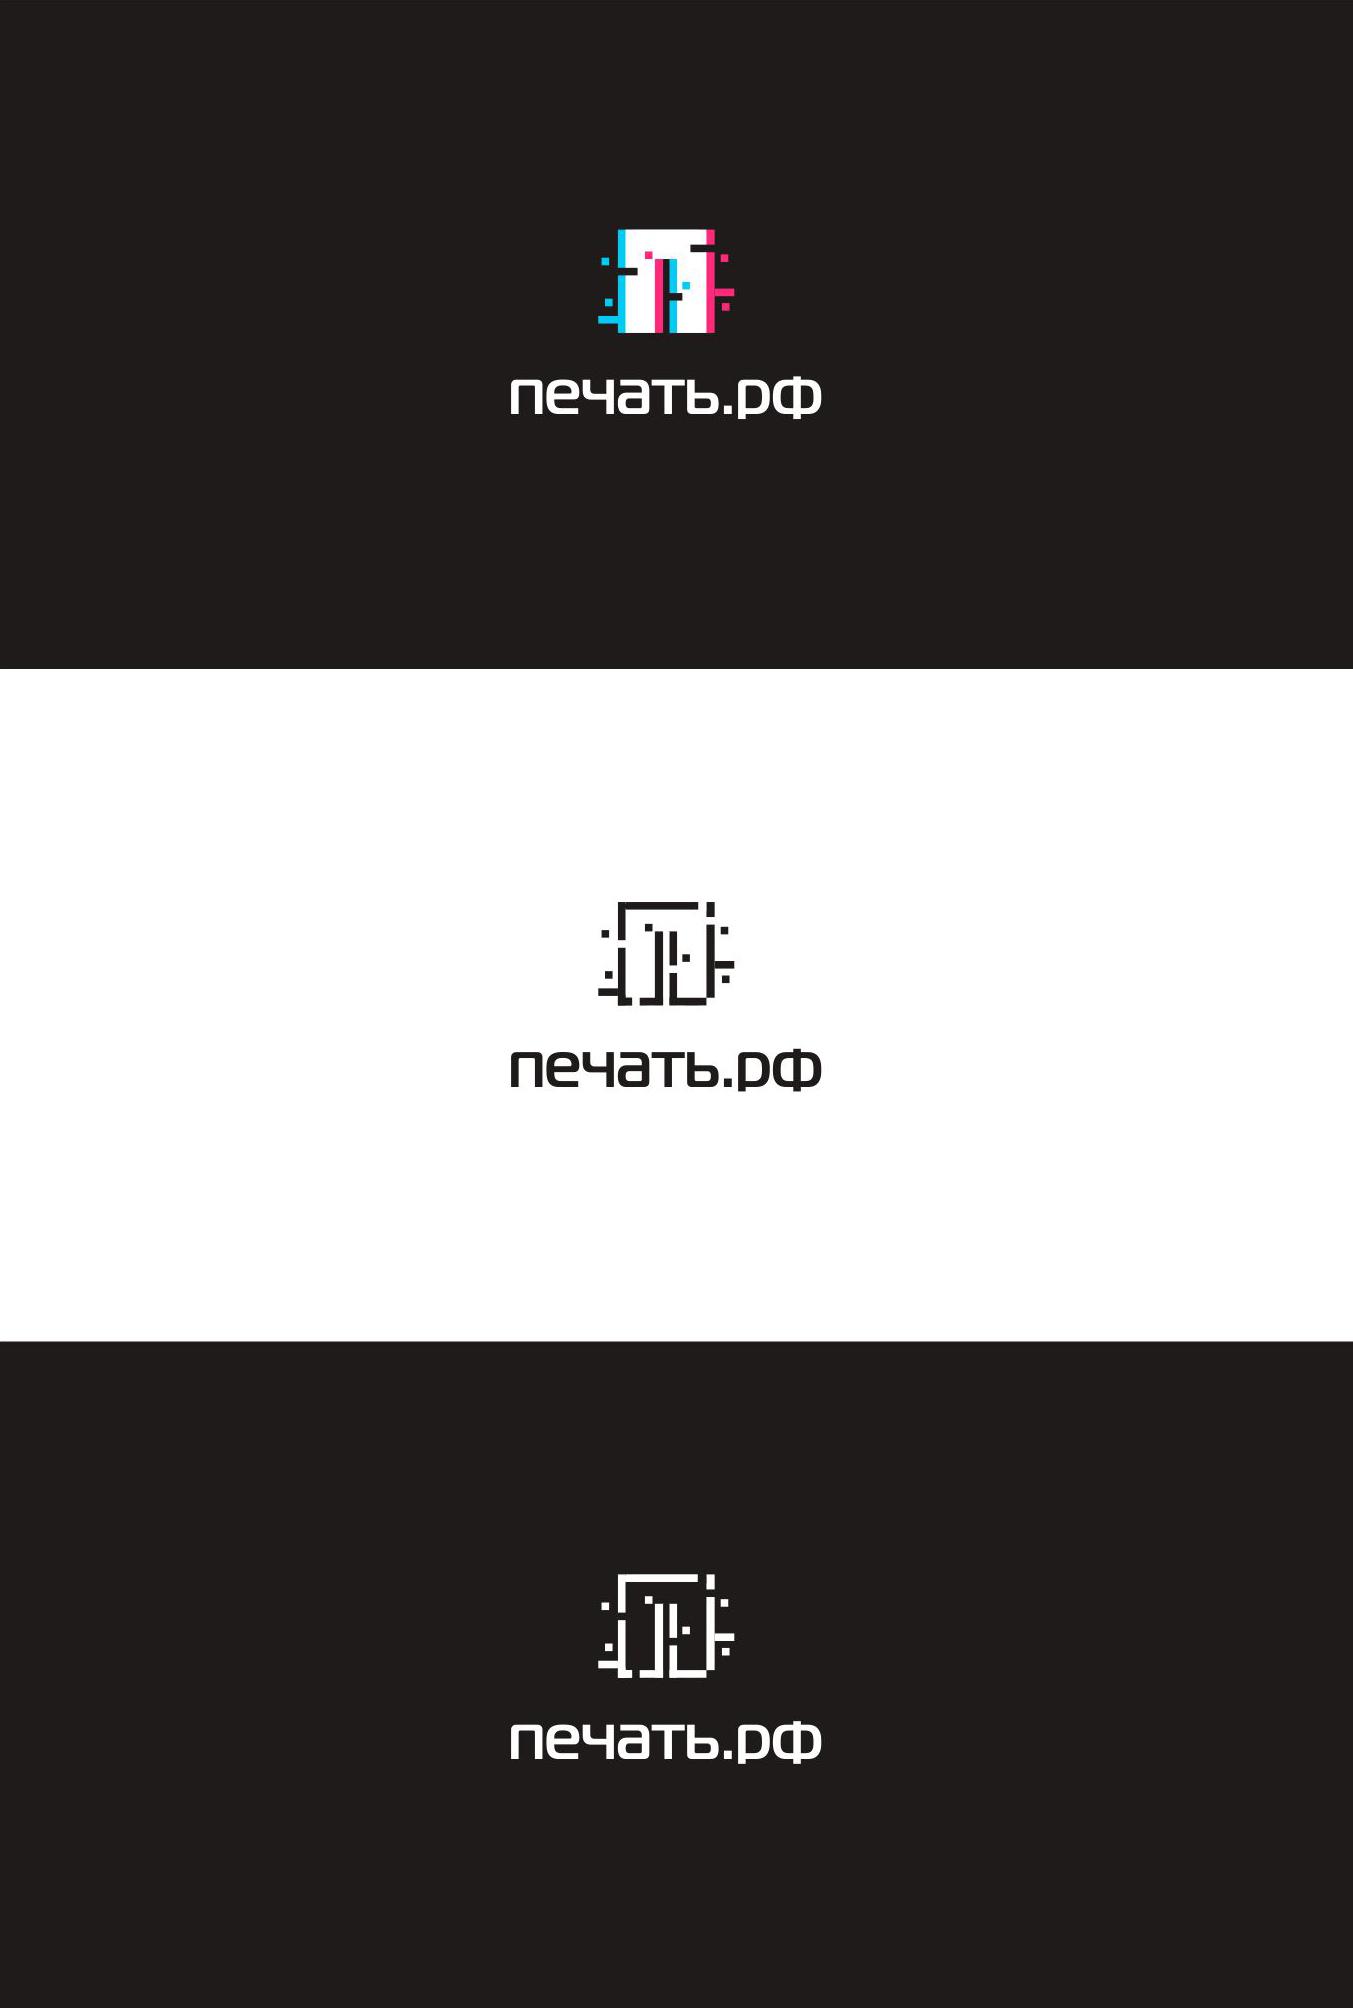 Логотип для веб-сервиса интерьерной печати и оперативной пол фото f_5585d2ddfb5646d9.jpg